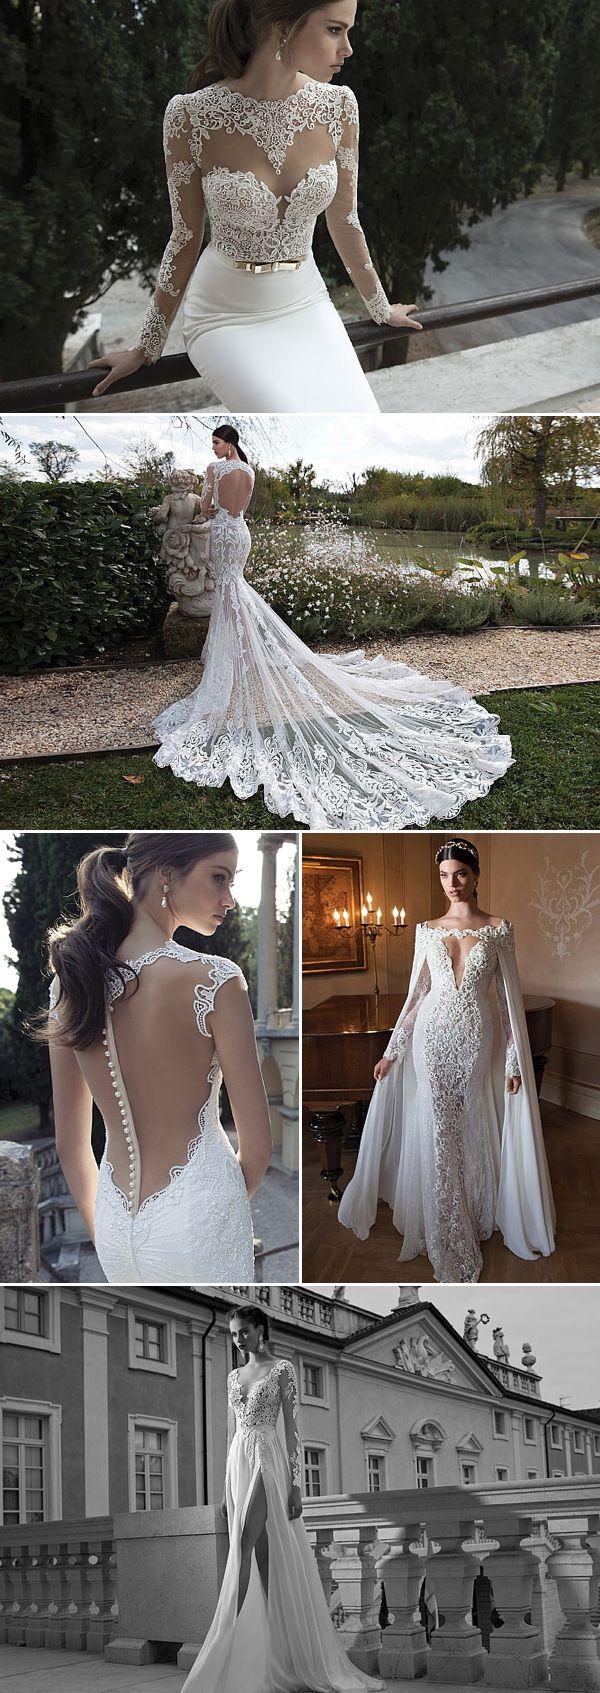 Sexiest Collection Ever Top 10 Israeli Wedding Dress Designers We Love Praise Wedding Israeli Wedding Dress Designer Tight Wedding Dress Sheer Wedding Dress